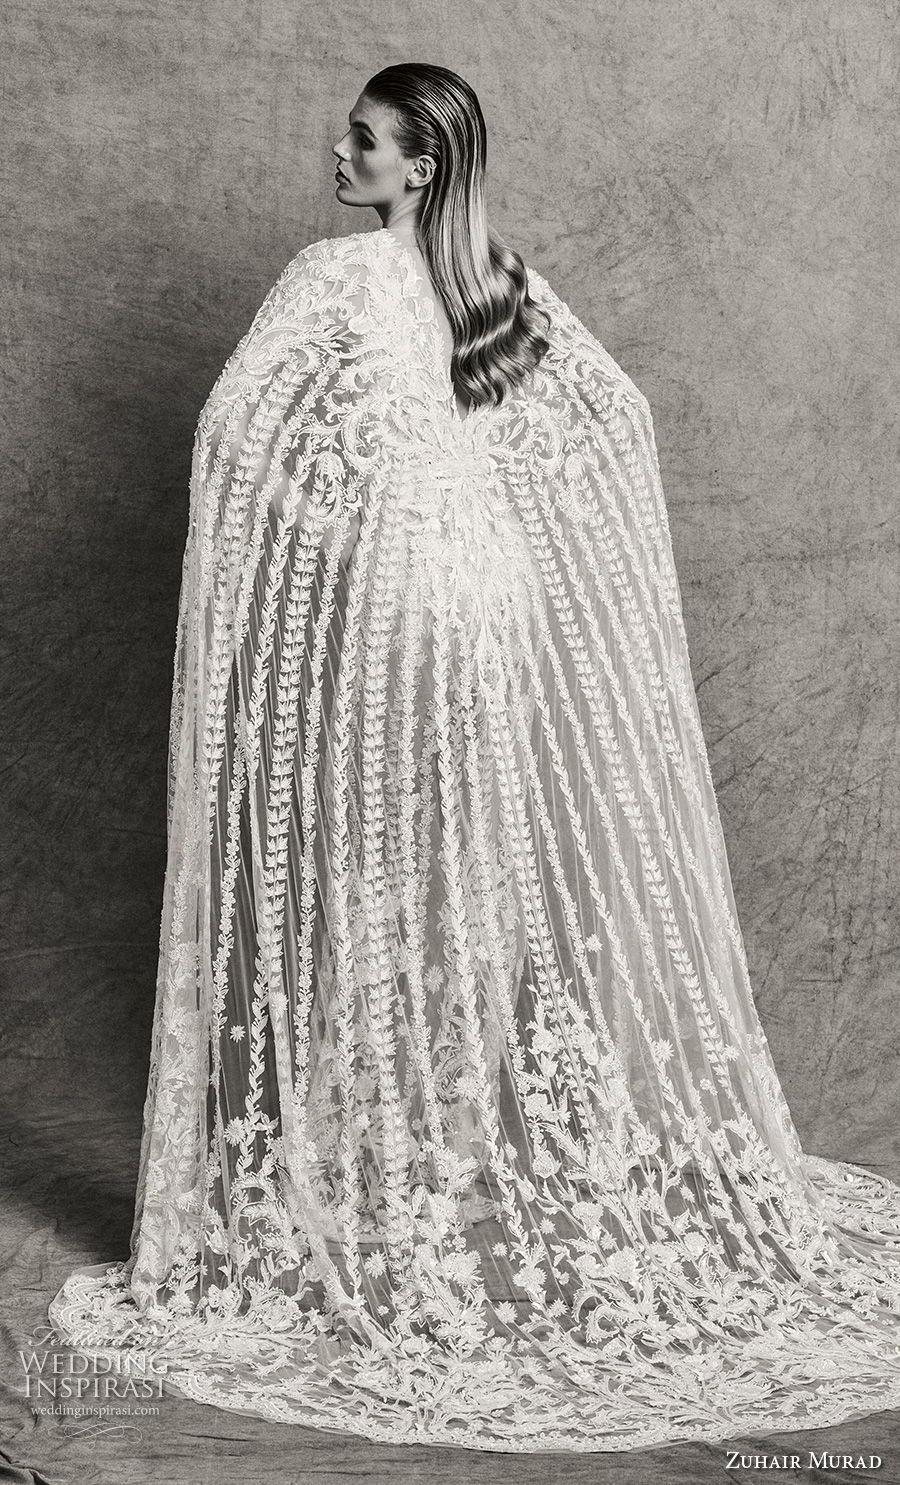 zuhair murad fall 2018 bridal sleeveless illusion bateau deep v neck full embellishment glamorous elegant fit and flare sheath wedding dress with cape sweep train (4) bv